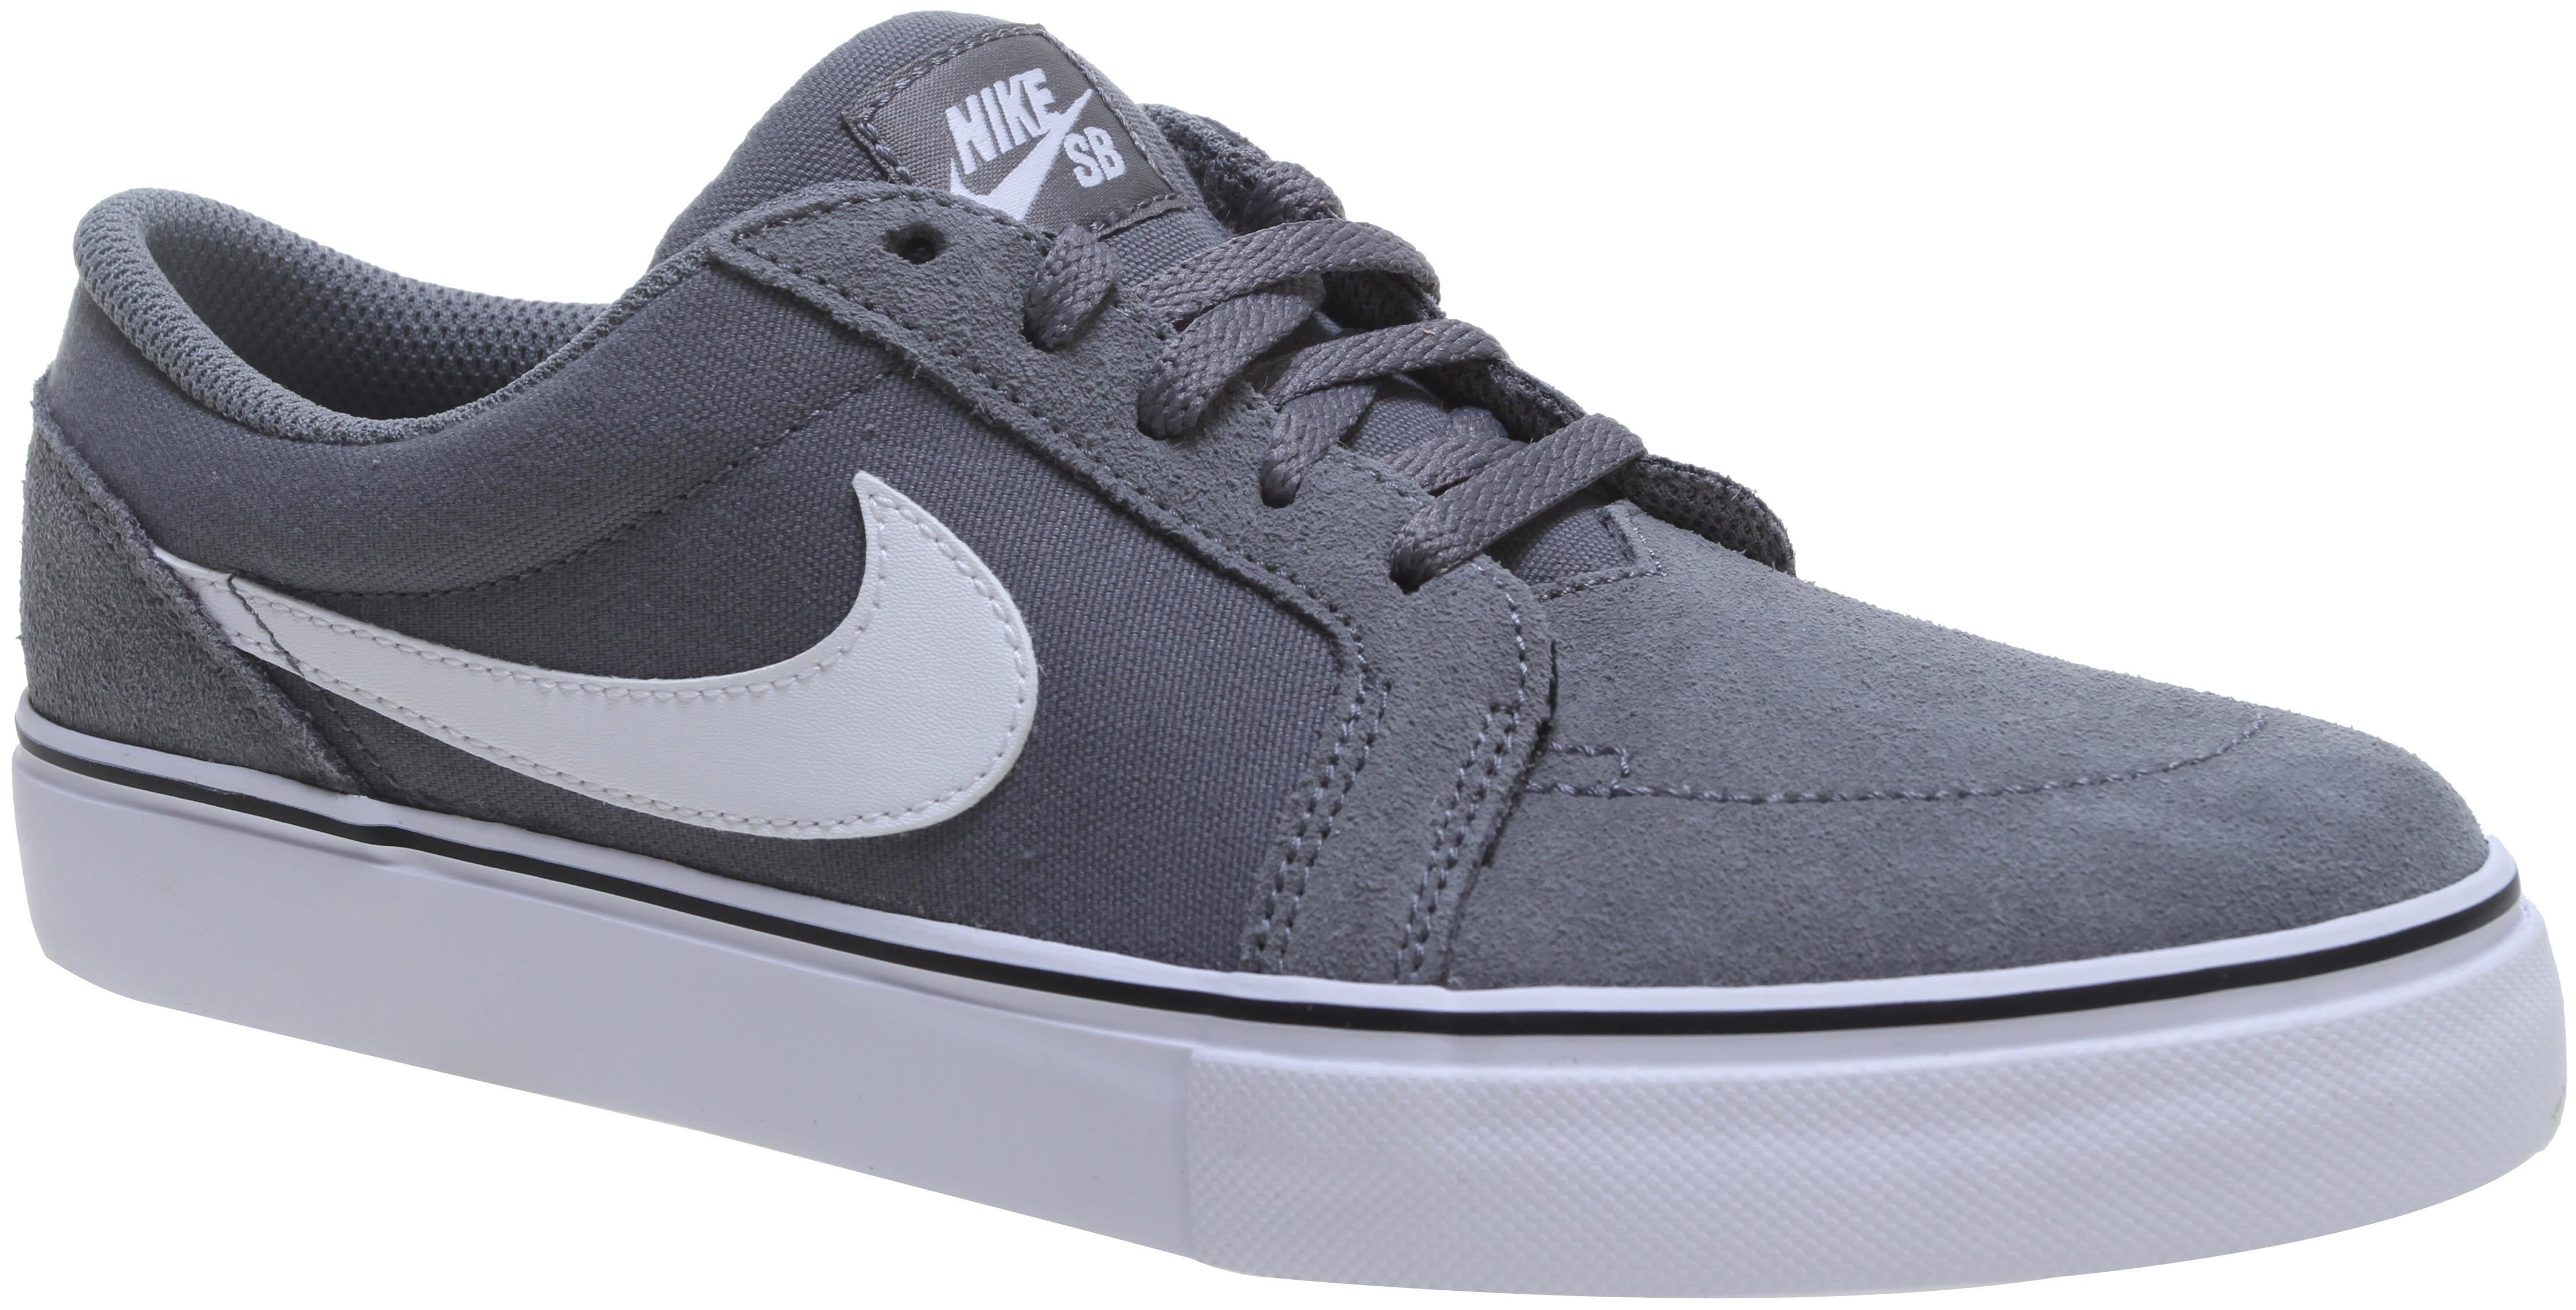 Nike Satire Ii Skate Shoes